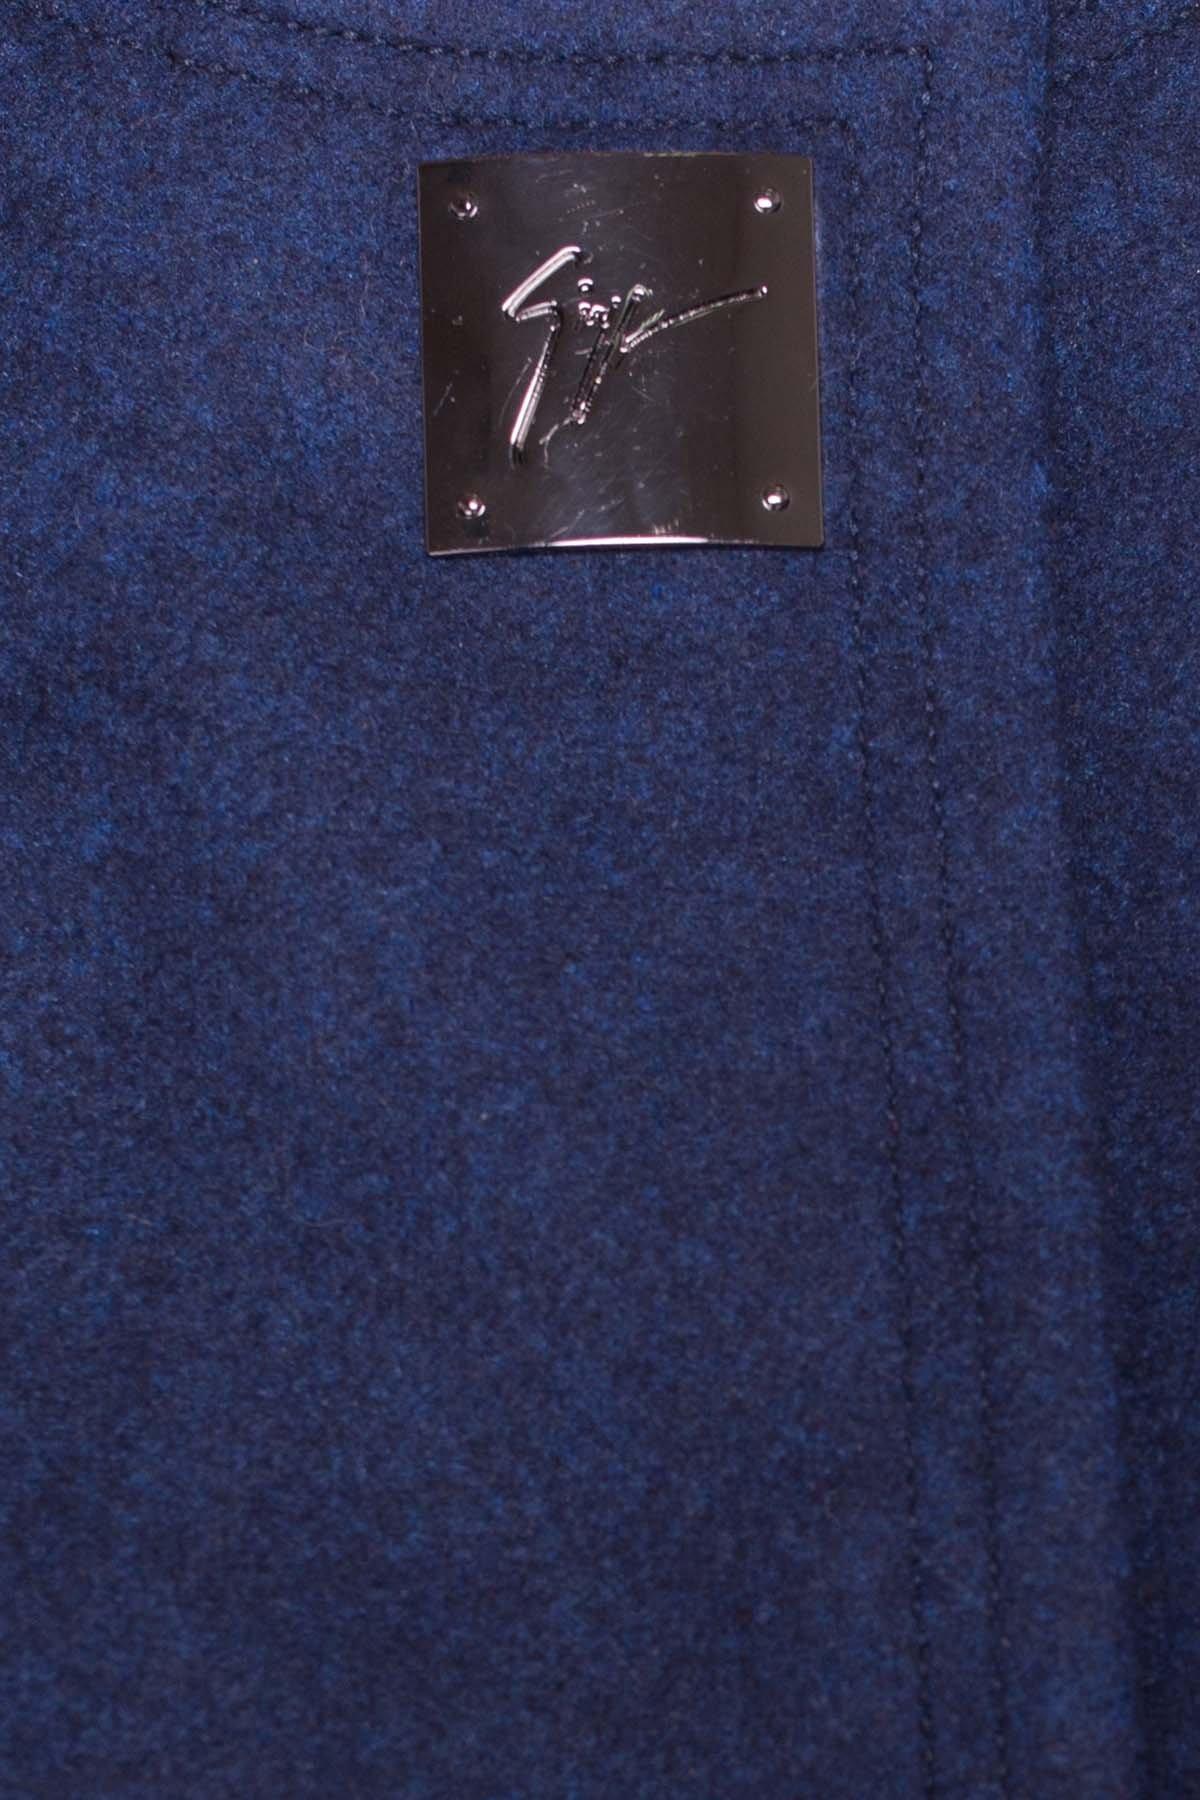 Демисезонное пальто Ферран 5369 АРТ. 36546 Цвет: Темно-синий 17 - фото 4, интернет магазин tm-modus.ru